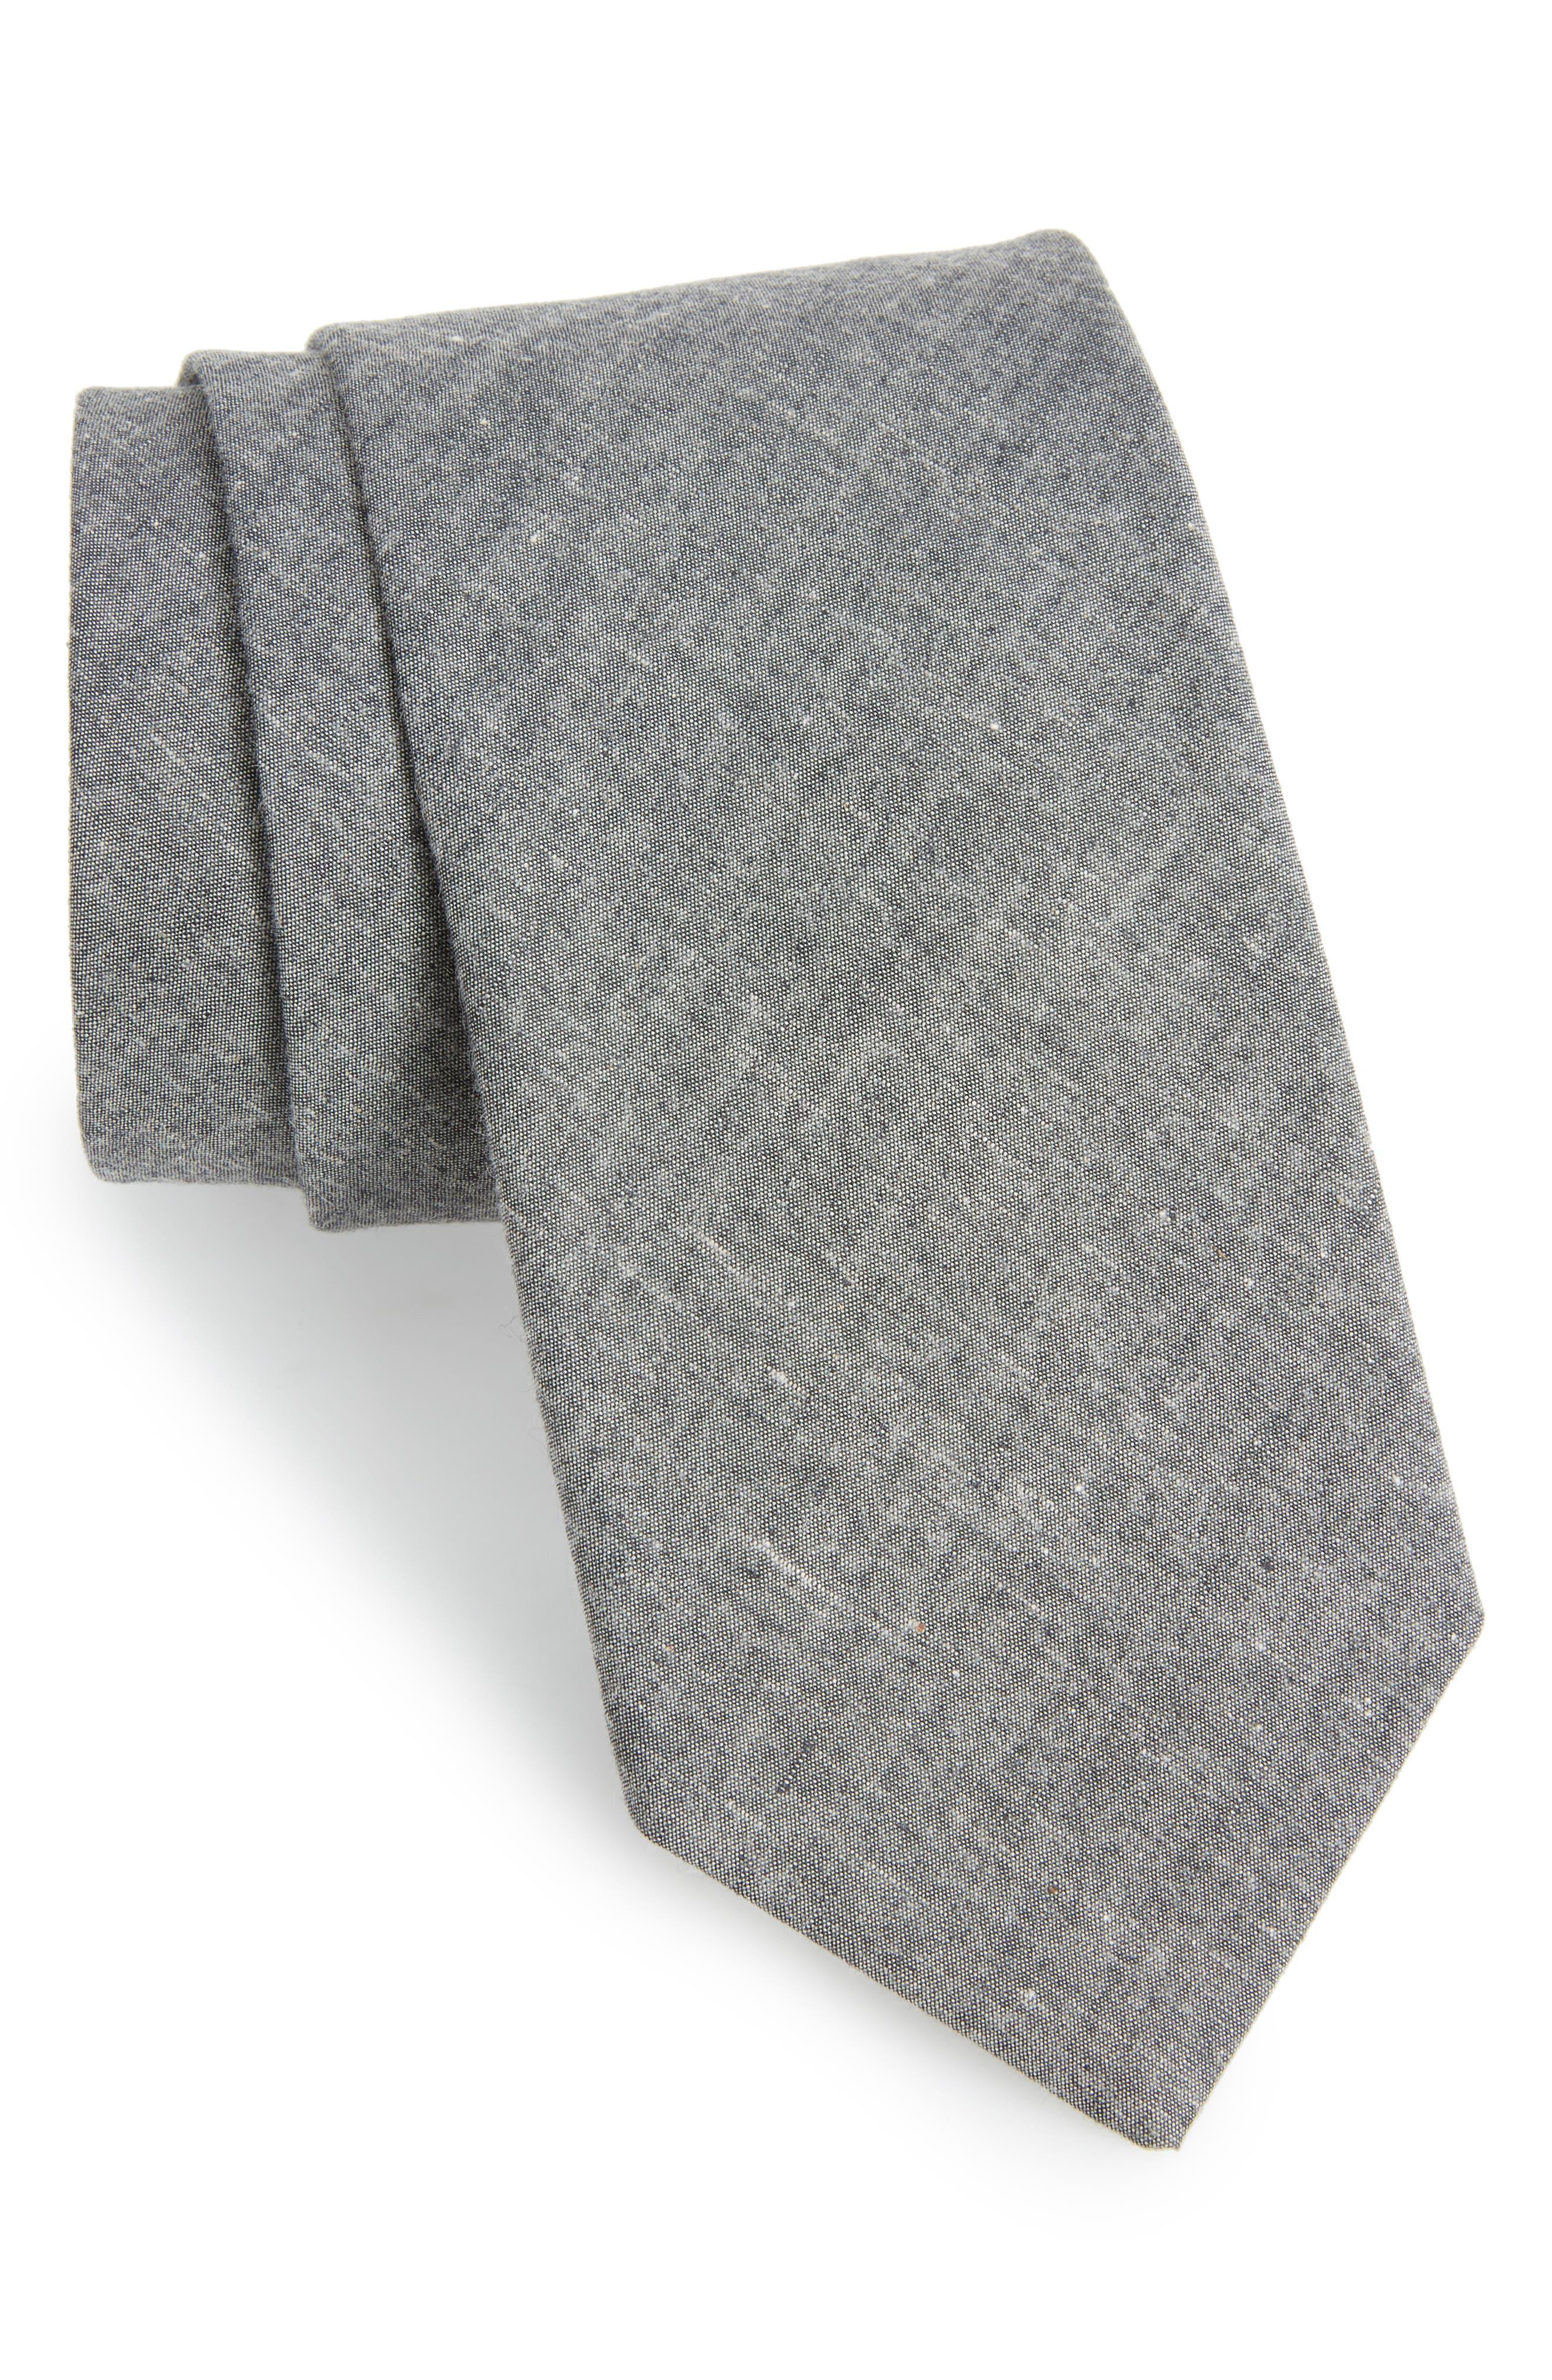 Bonobos Chambray Cotton Tie